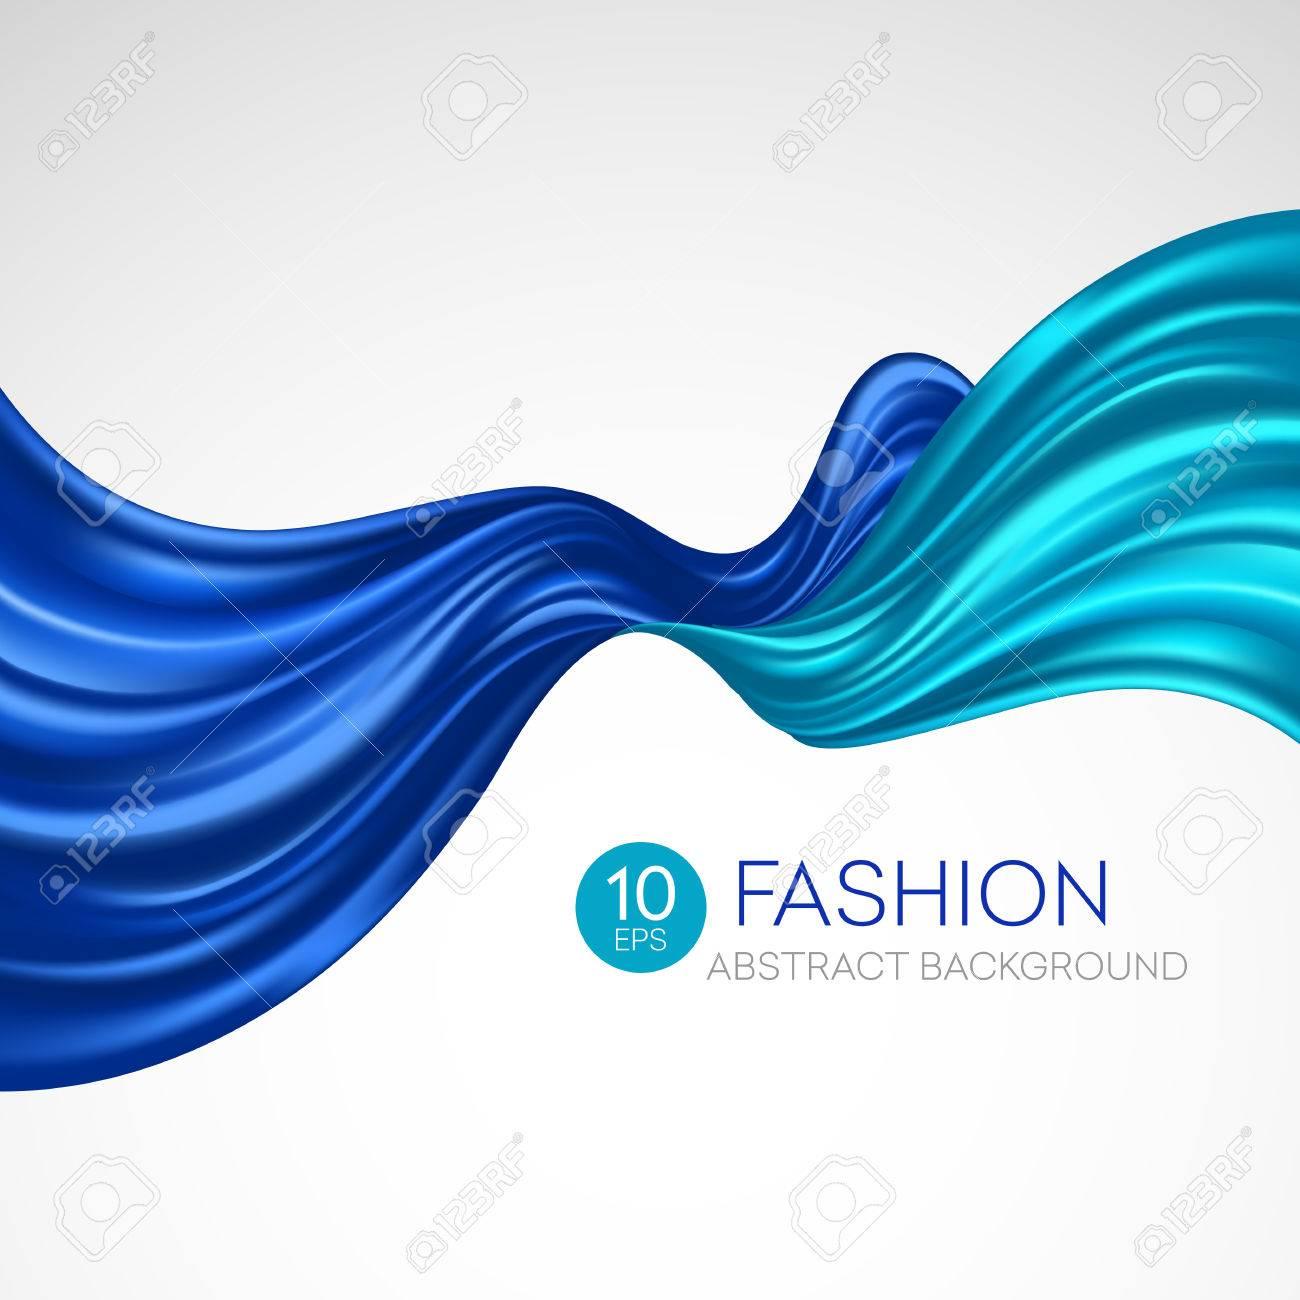 Blue flying silk fabric. Fashion background. Vector illustration EPS10 - 56522354